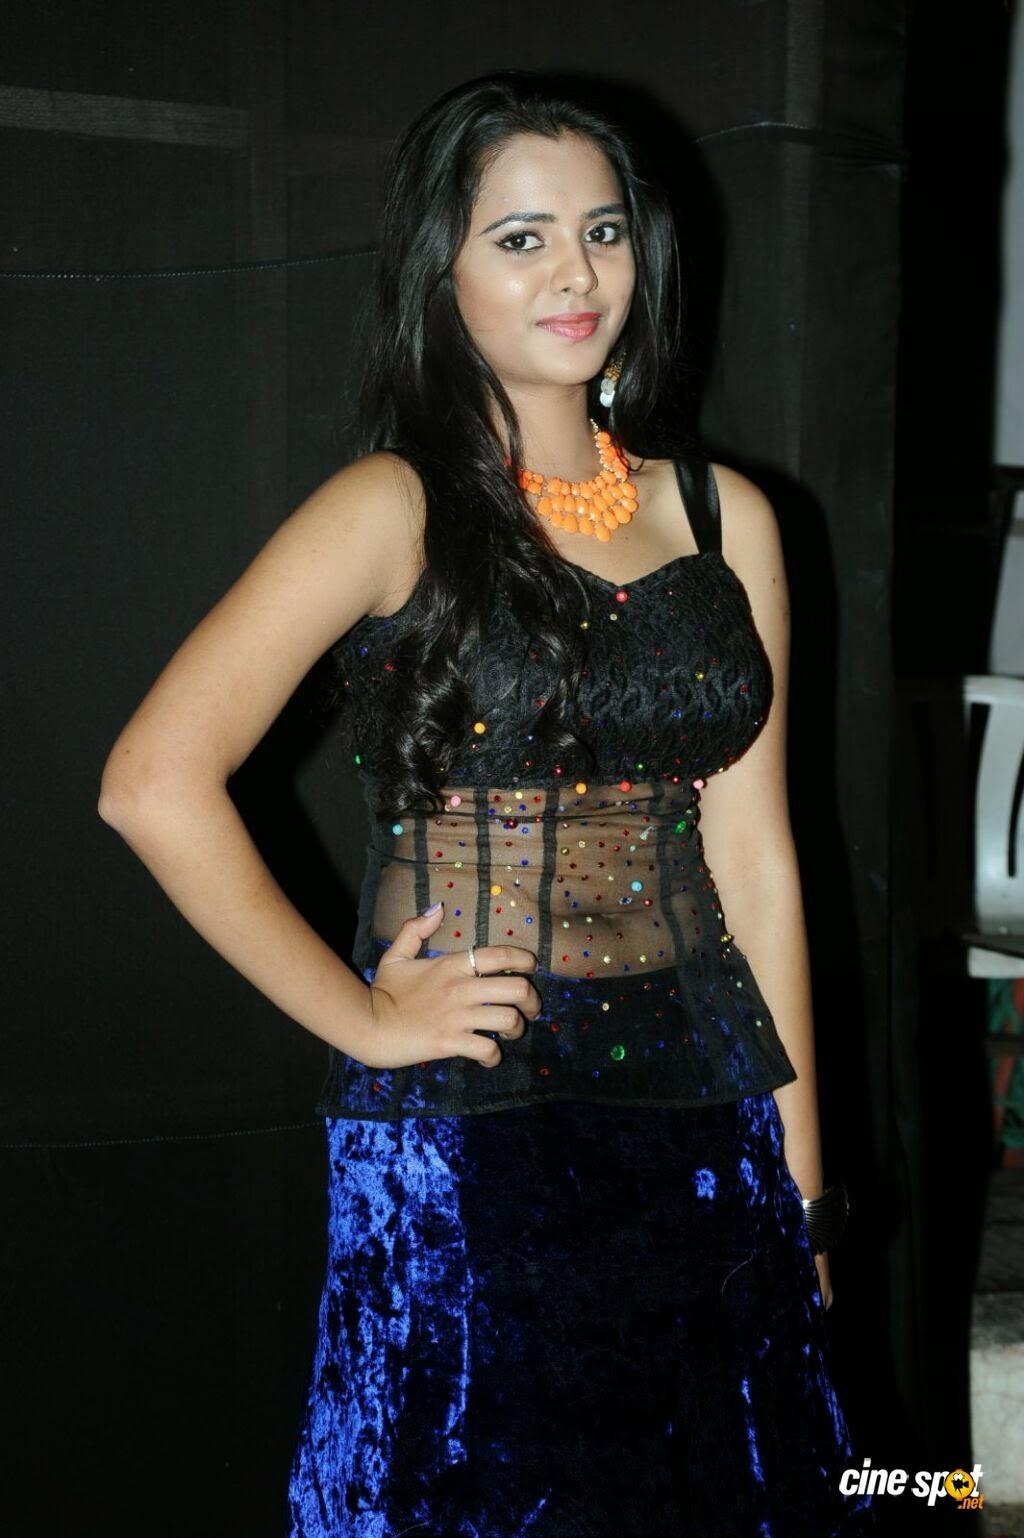 www heroines hot photos com